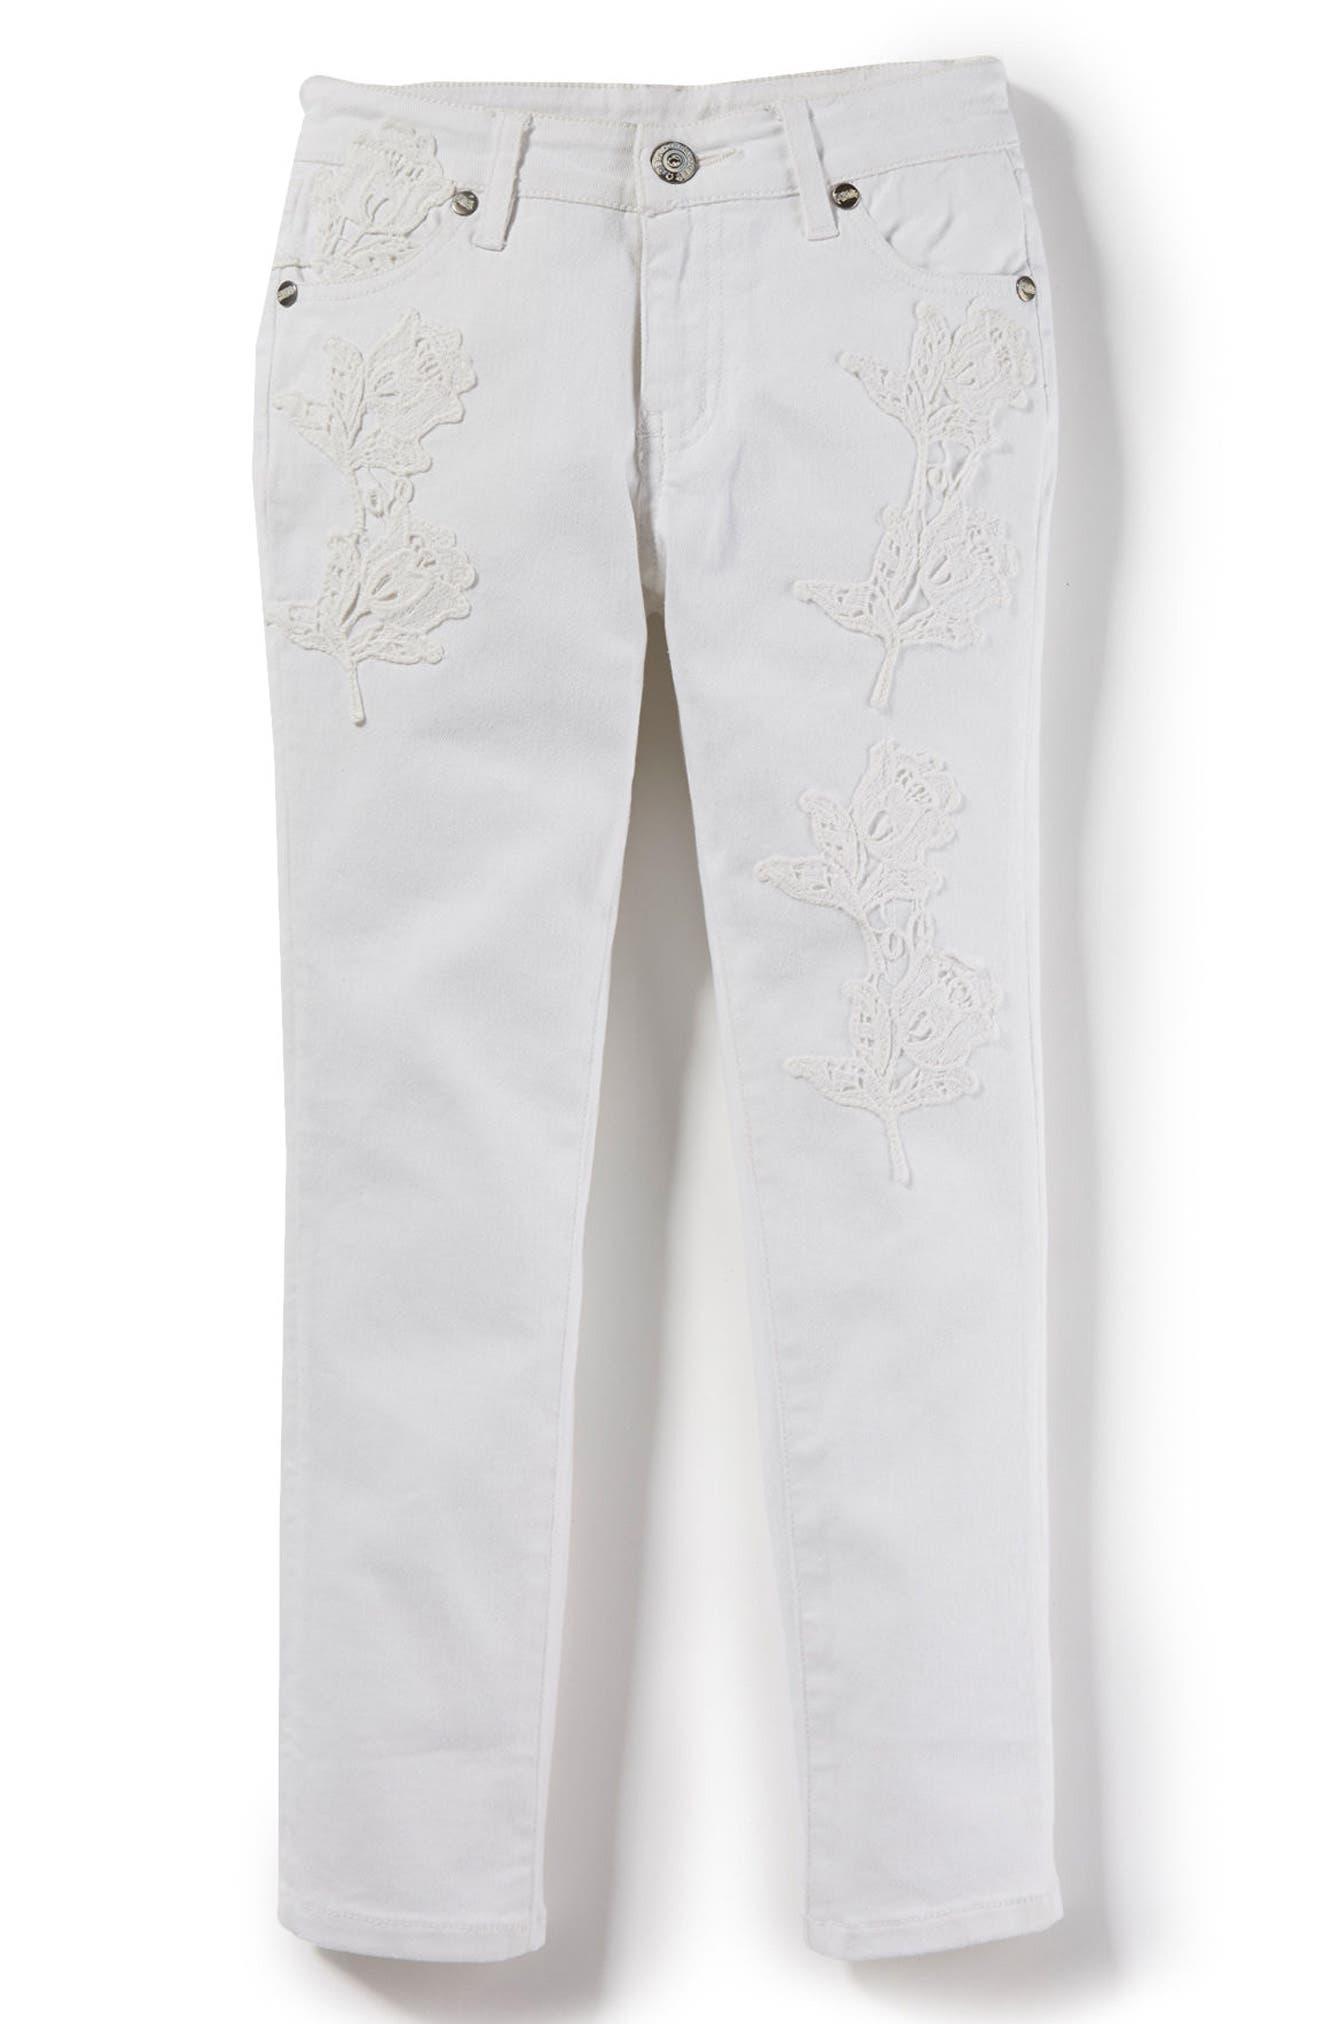 Audrey Crochet Skinny Jeans,                         Main,                         color, White